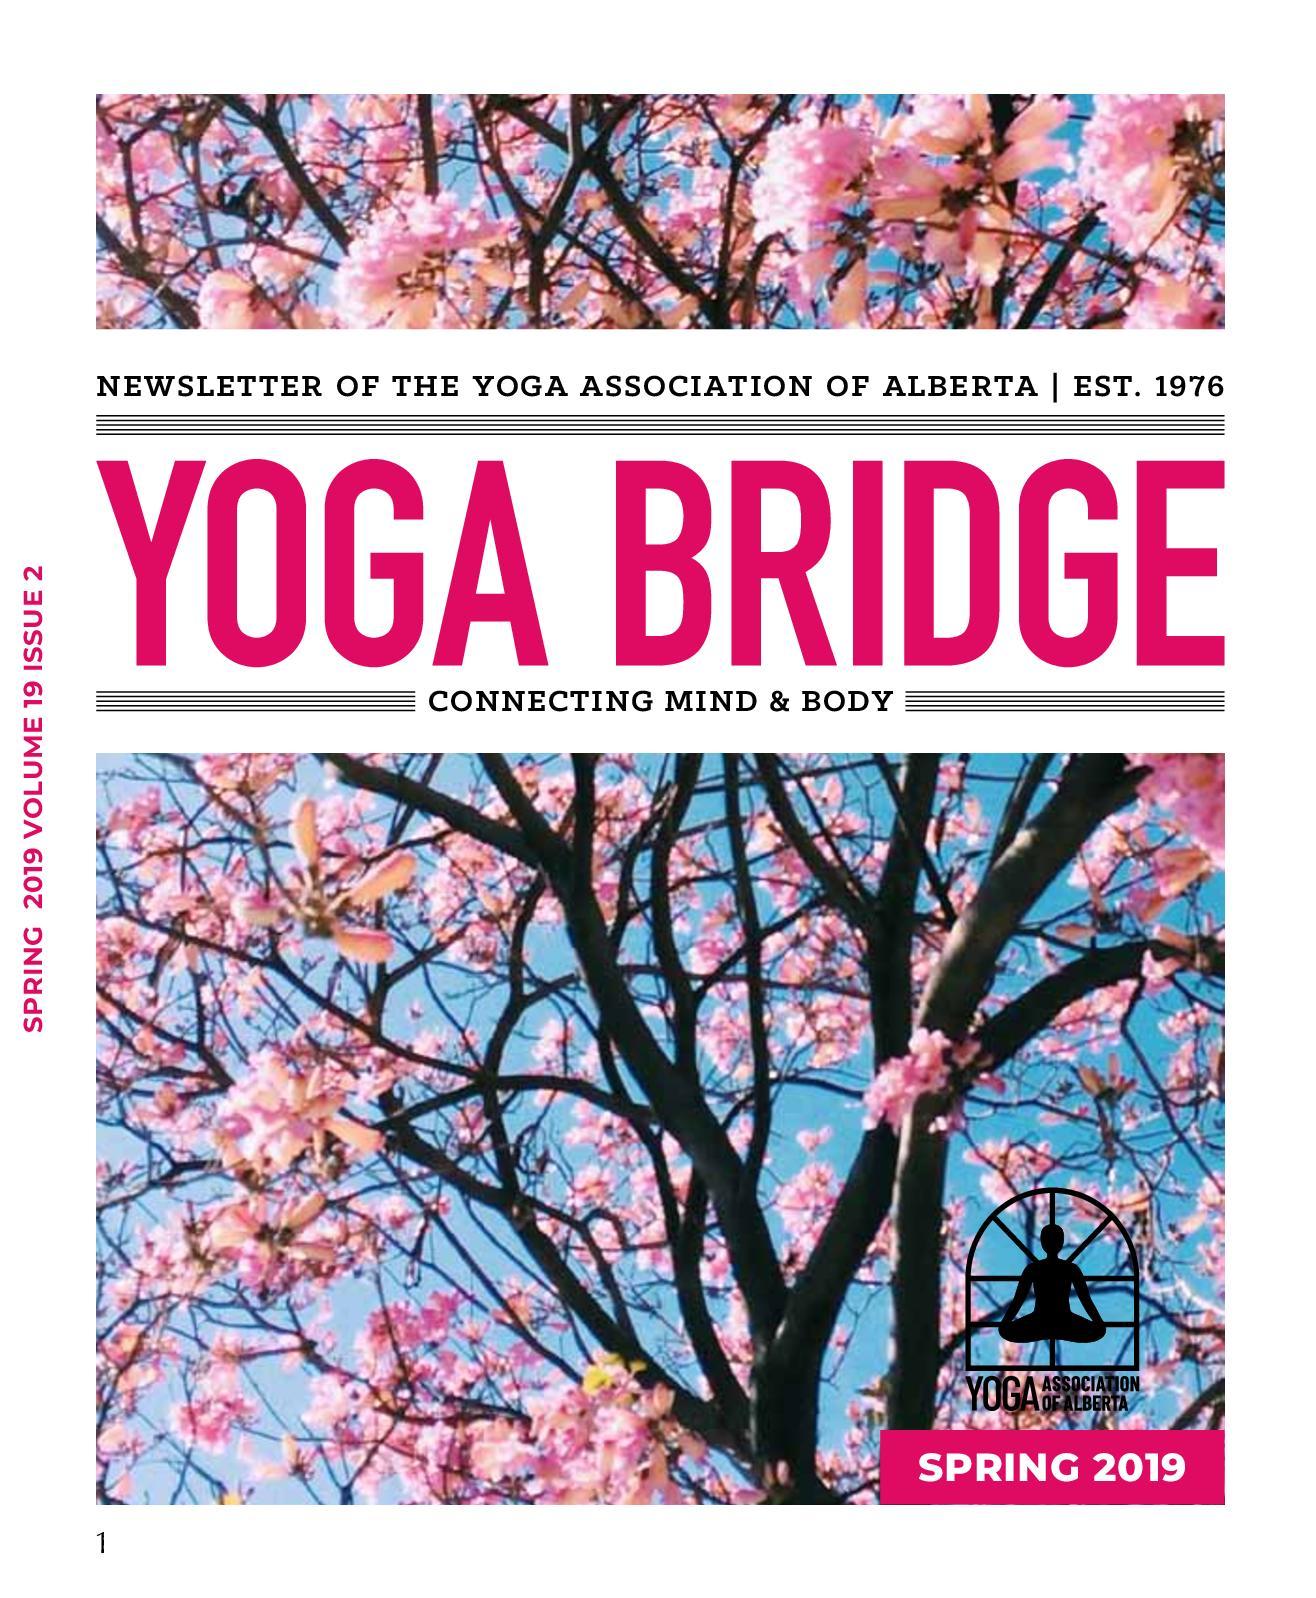 fcf65bddf Calaméo - 2019 Spring Yoga Bridge Newsletter